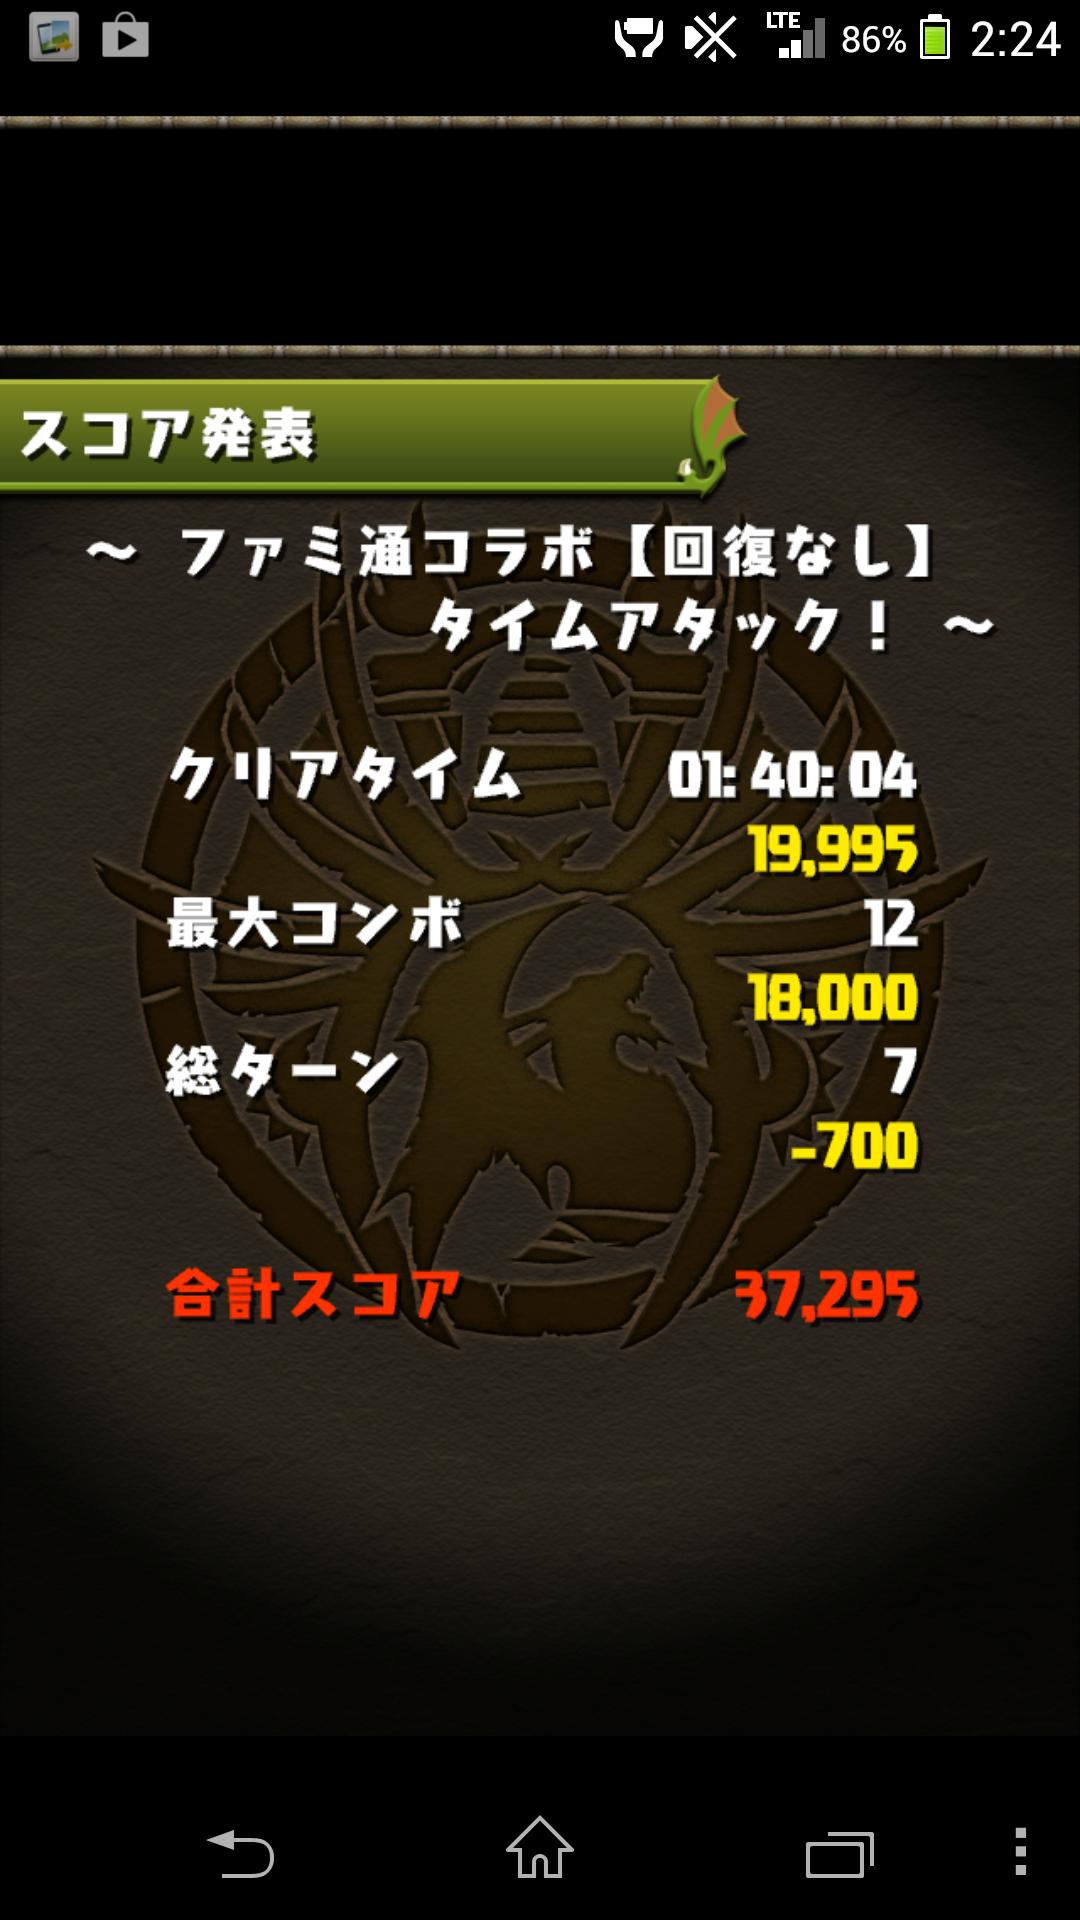 Screenshot_2014-05-02-02-24-22.png